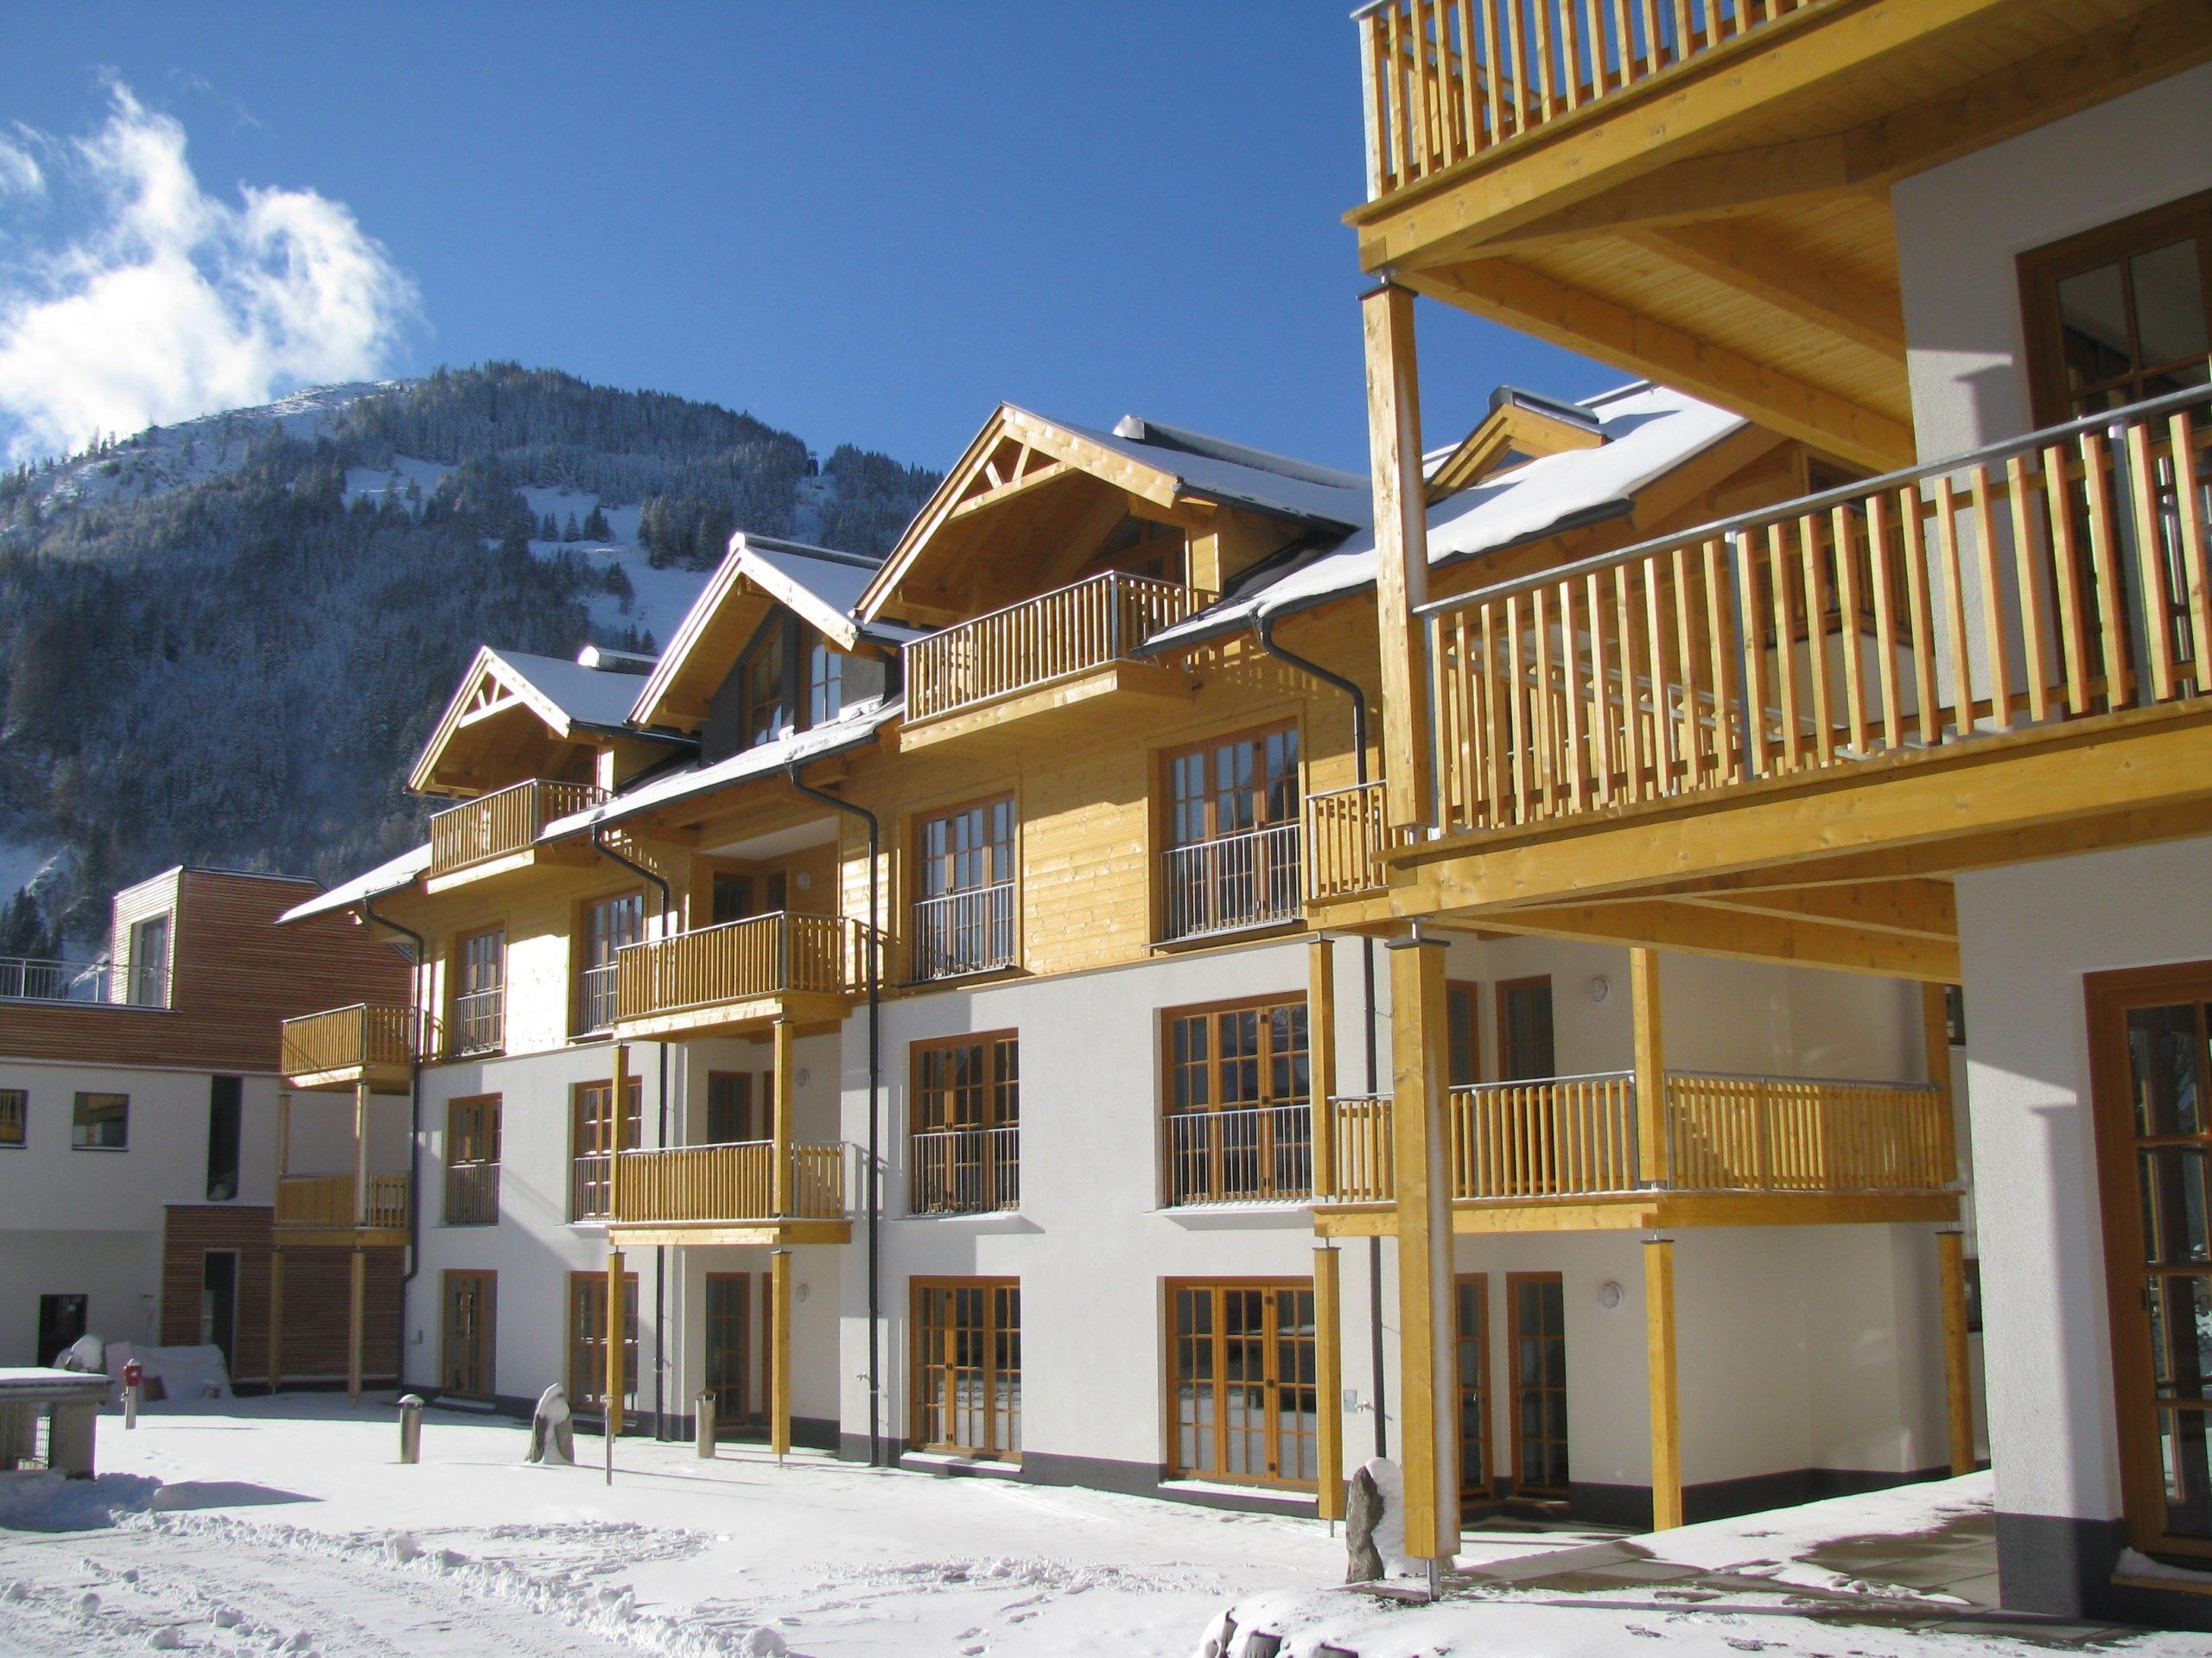 Appartement Schönblick Mountain-Resort - 4-6 personen